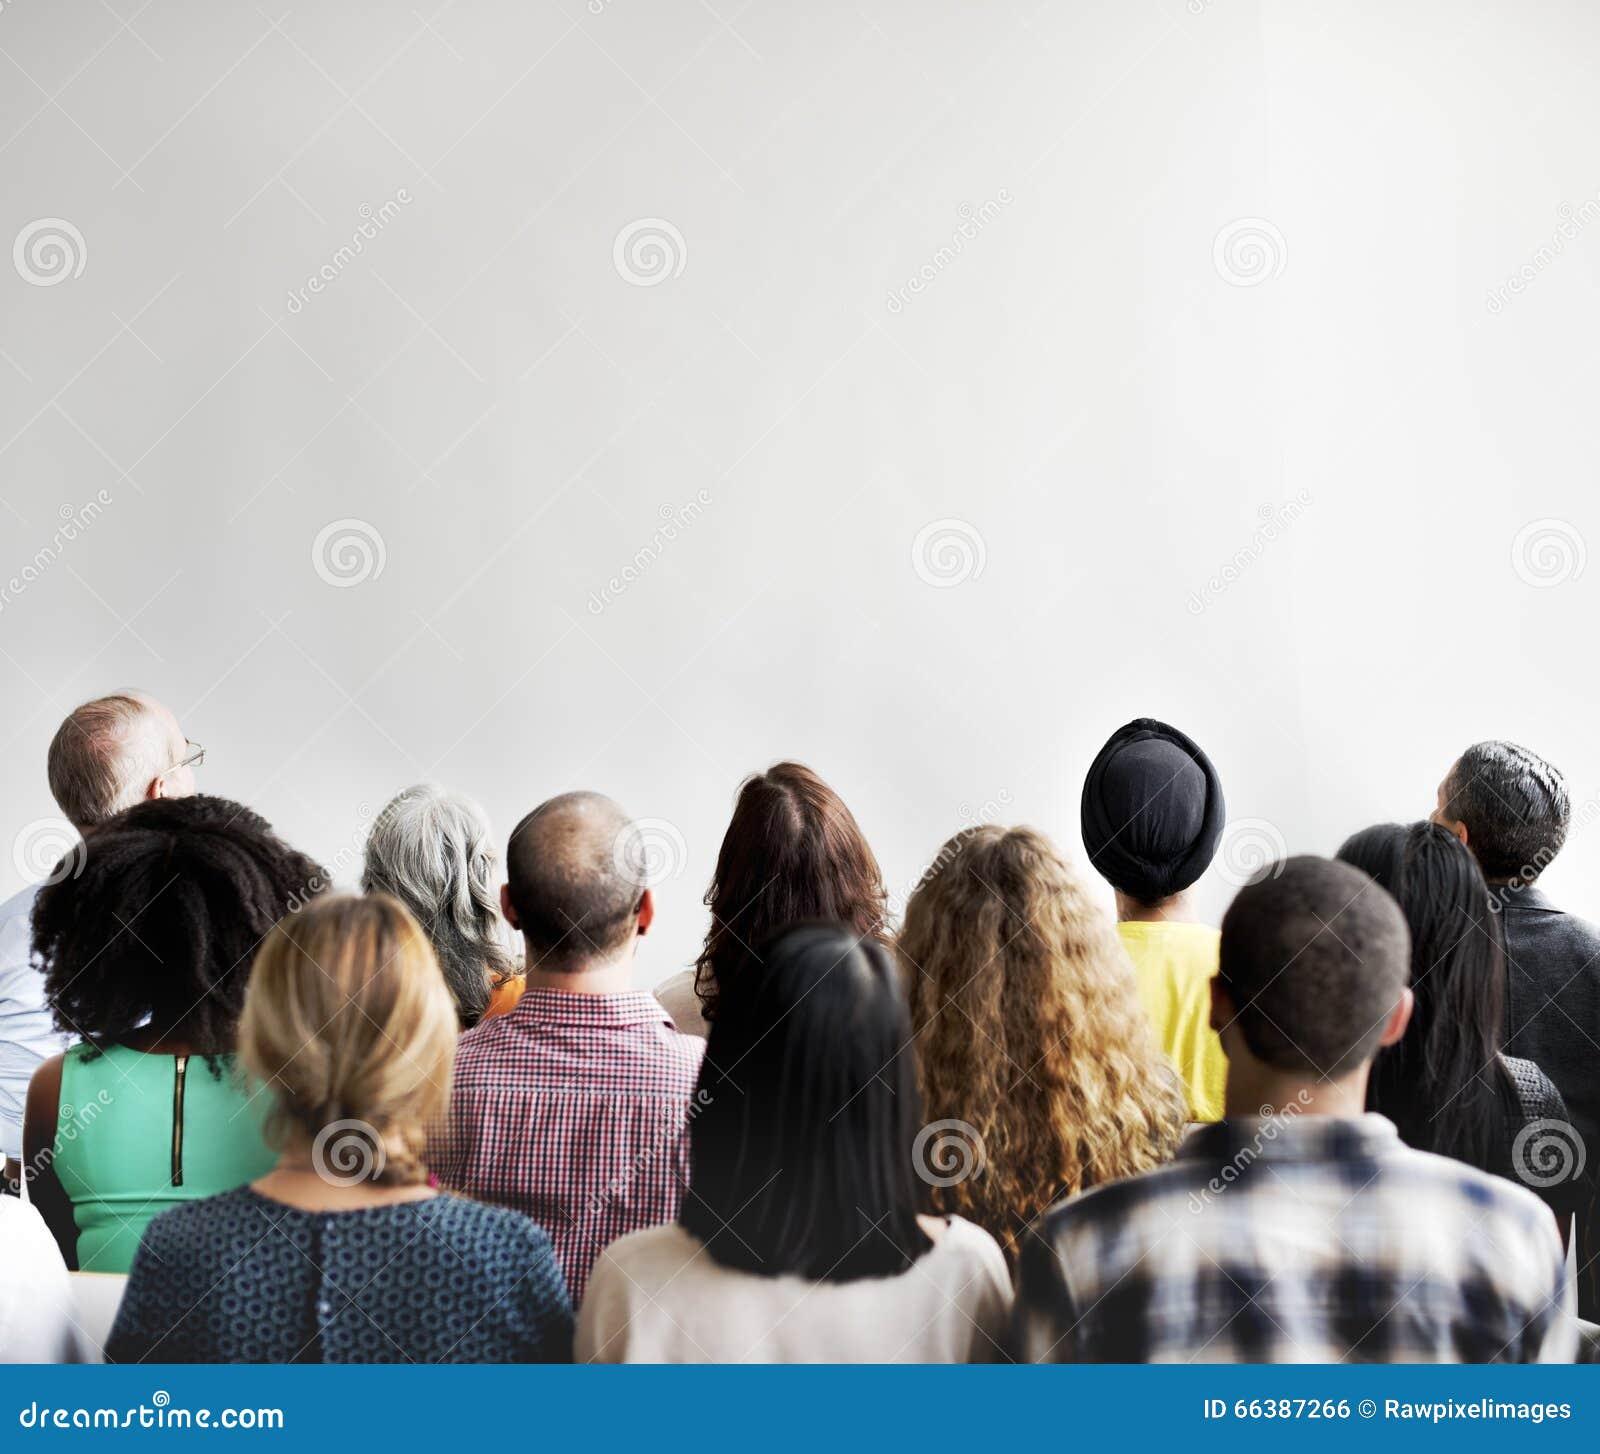 Zaken Team Seminar Conference Audience Concept